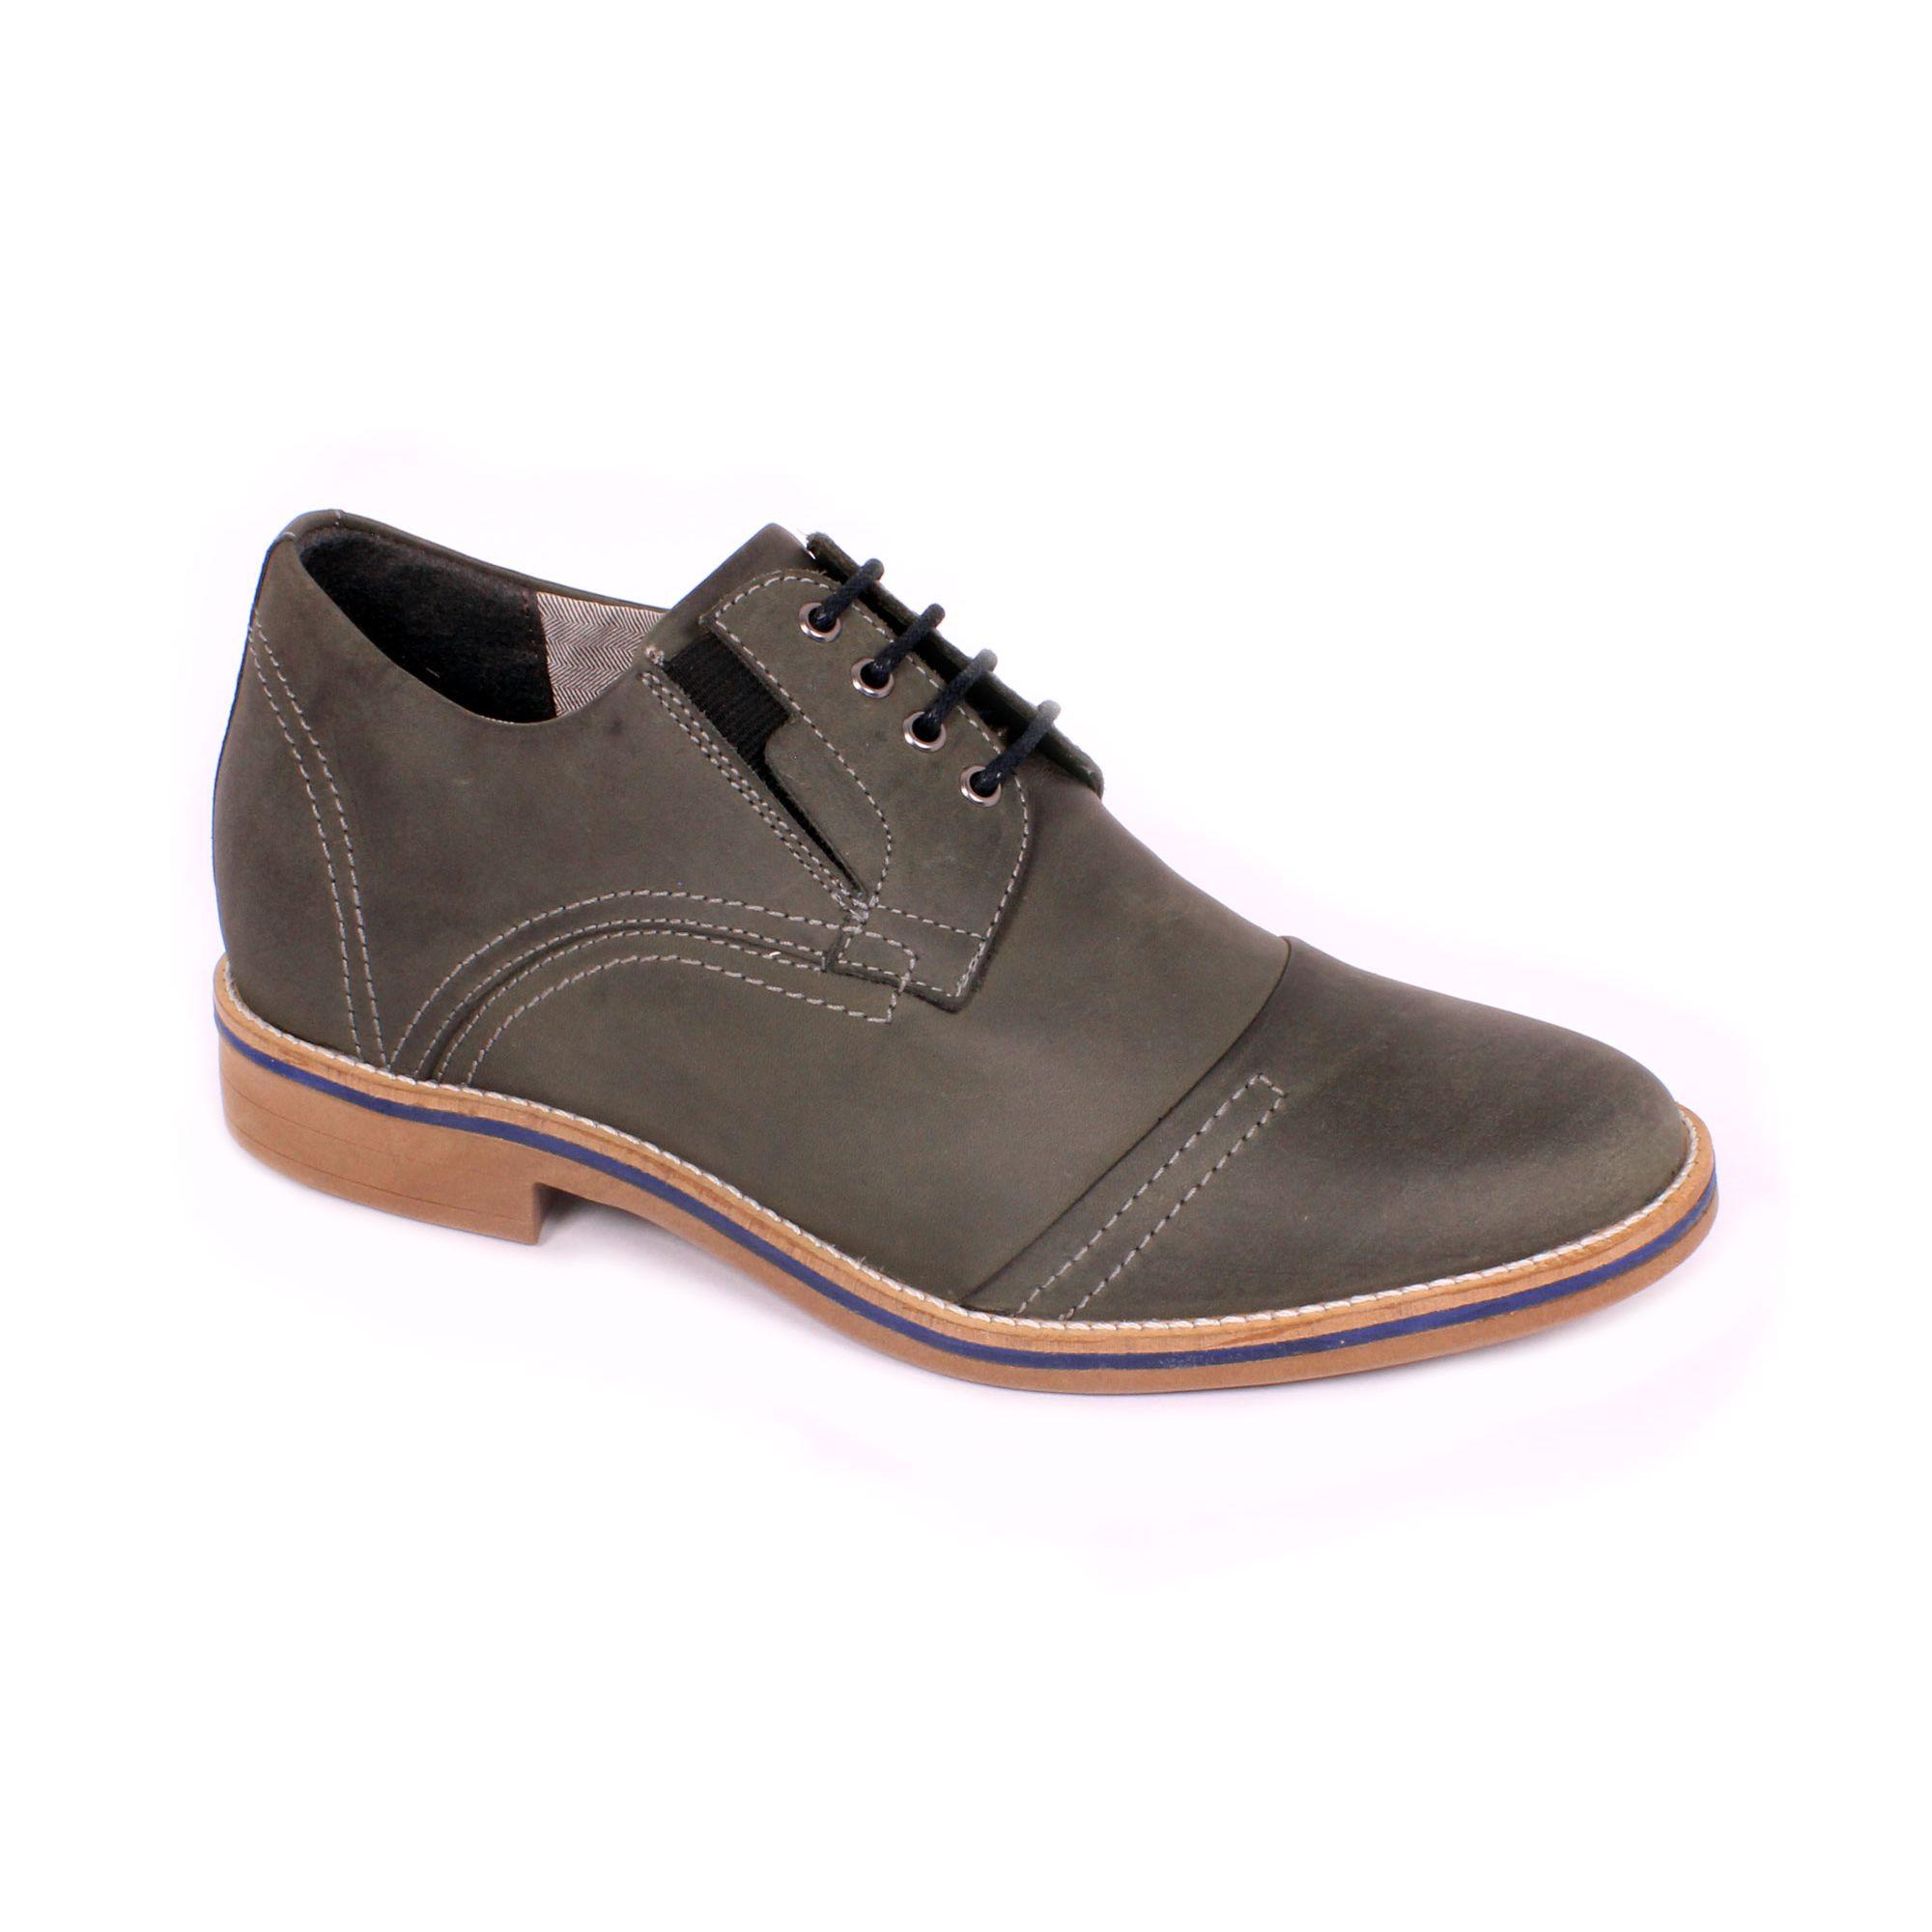 Zapato Casual Trend Gris Petroleo Max Denegri +7cm de Altura_70921